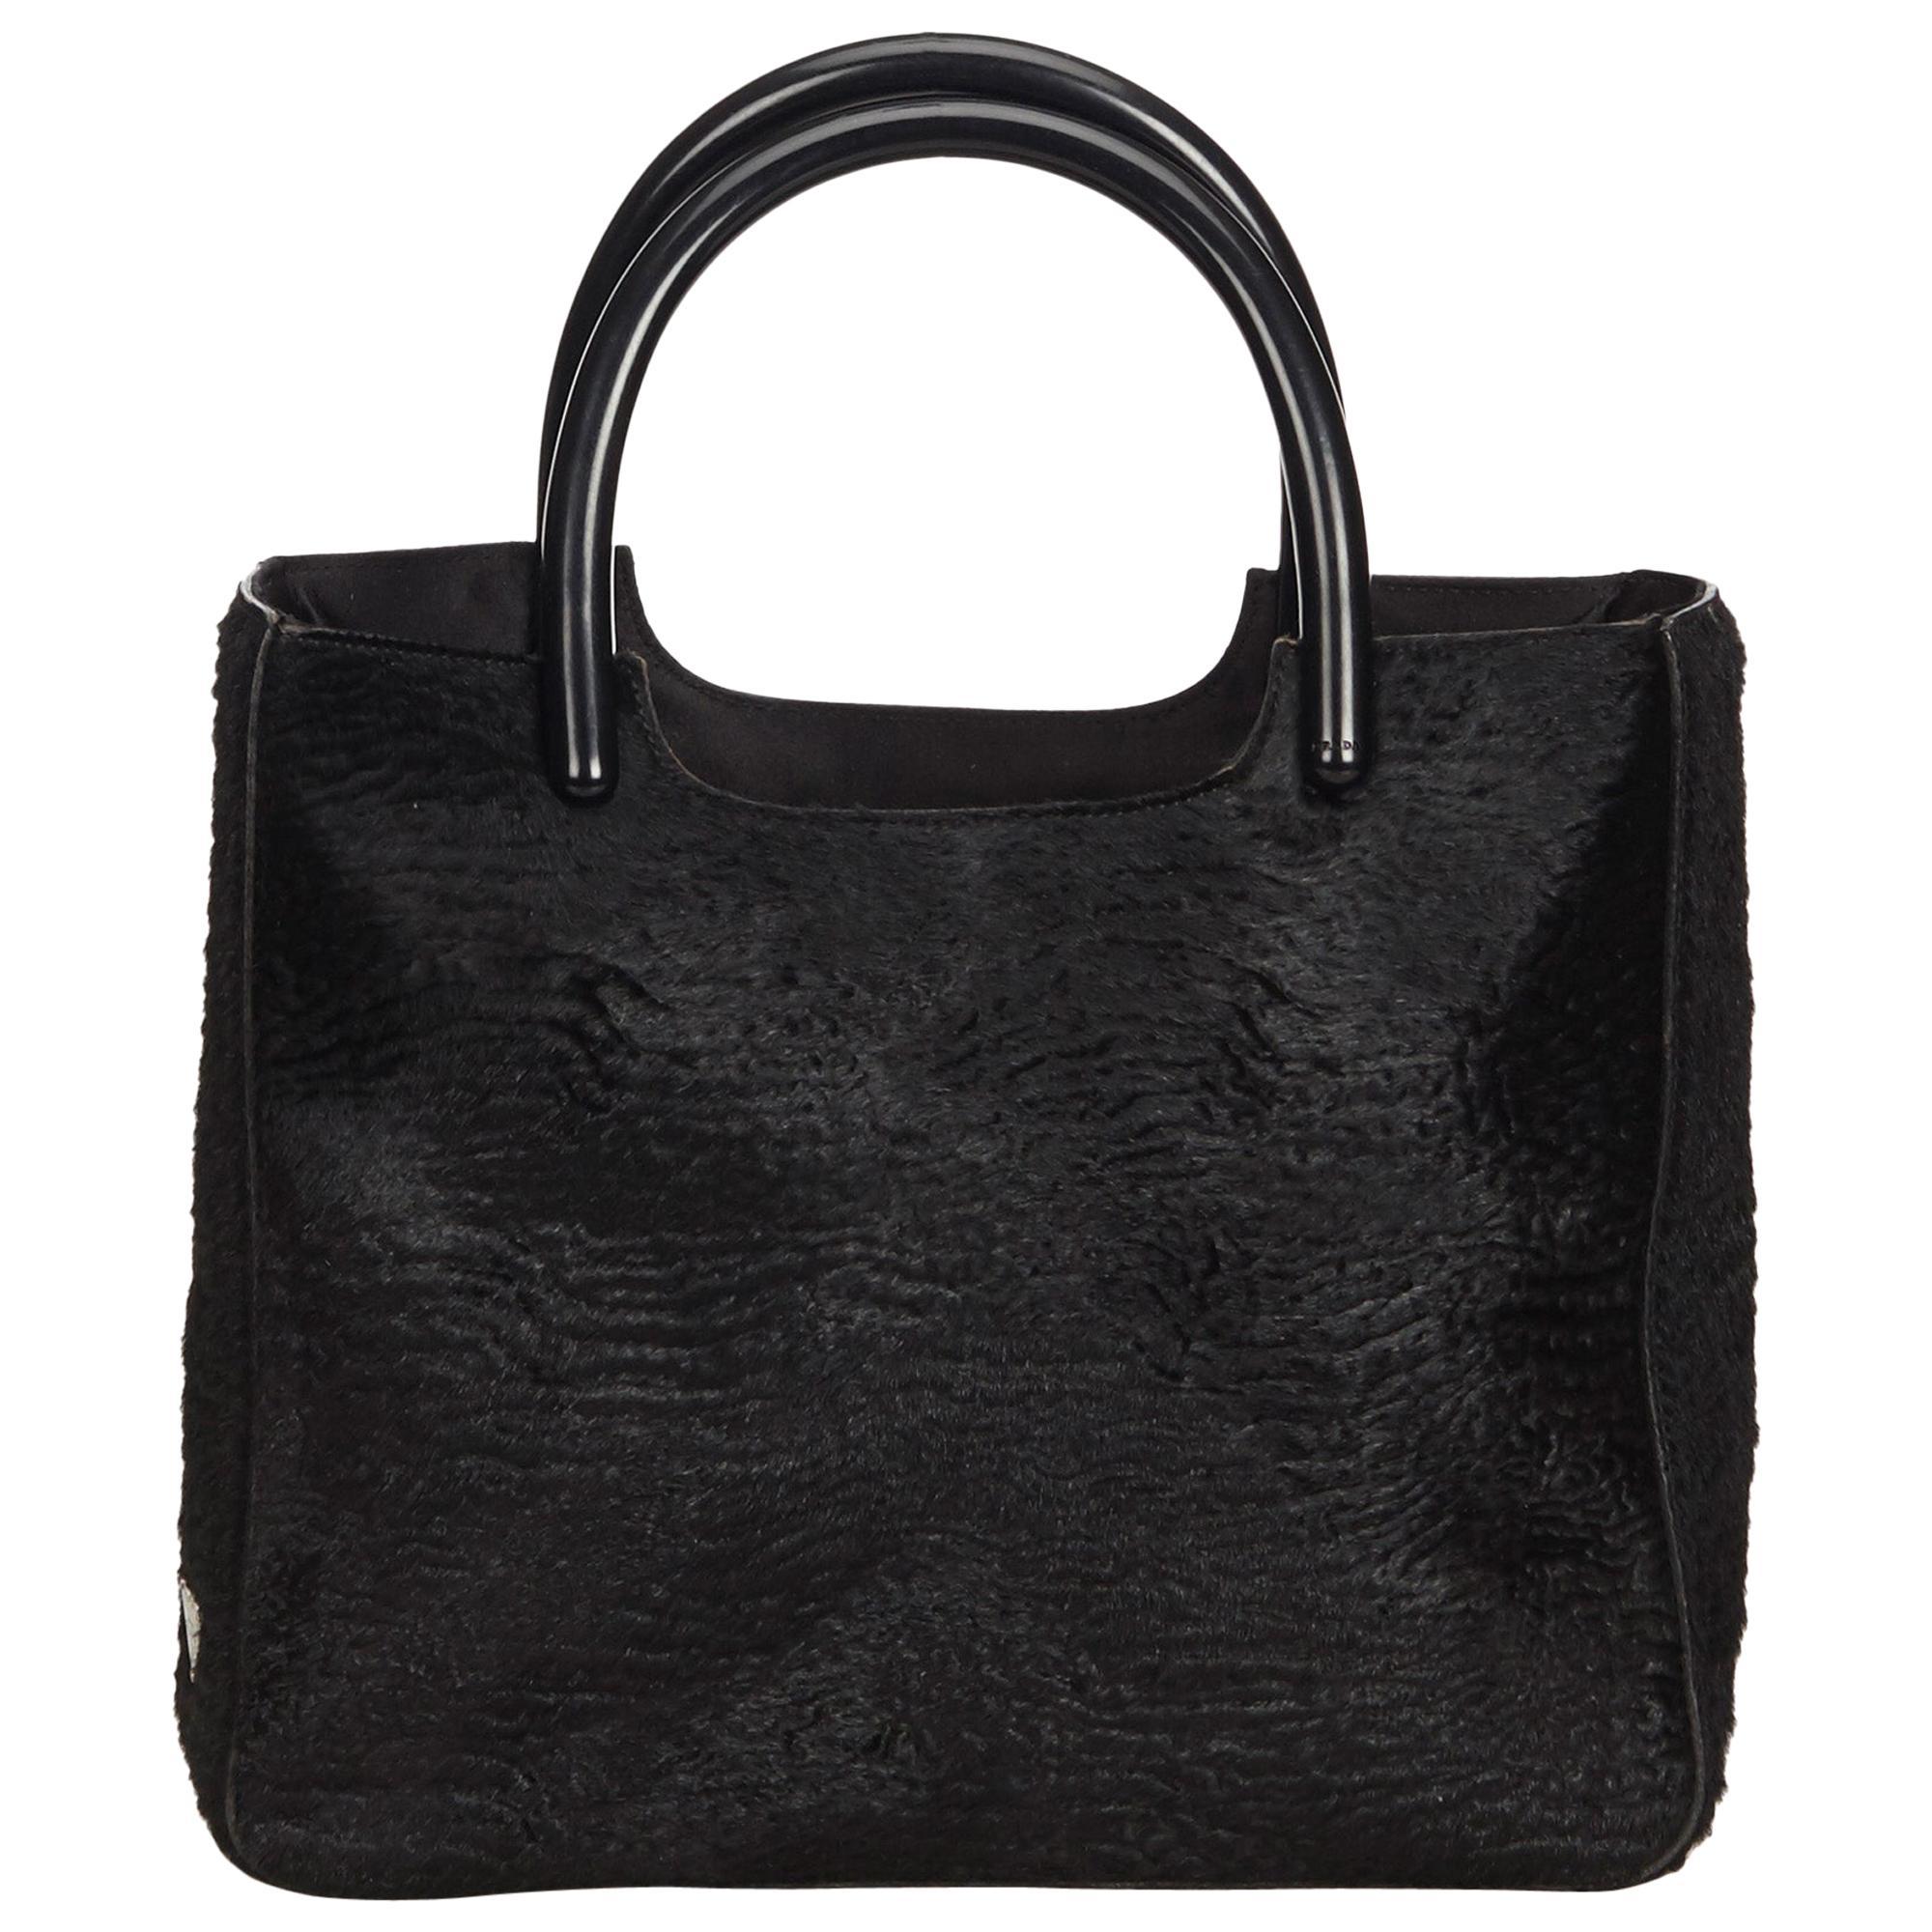 a457d04d82 Vintage Prada Handbags and Purses - 1,347 For Sale at 1stdibs